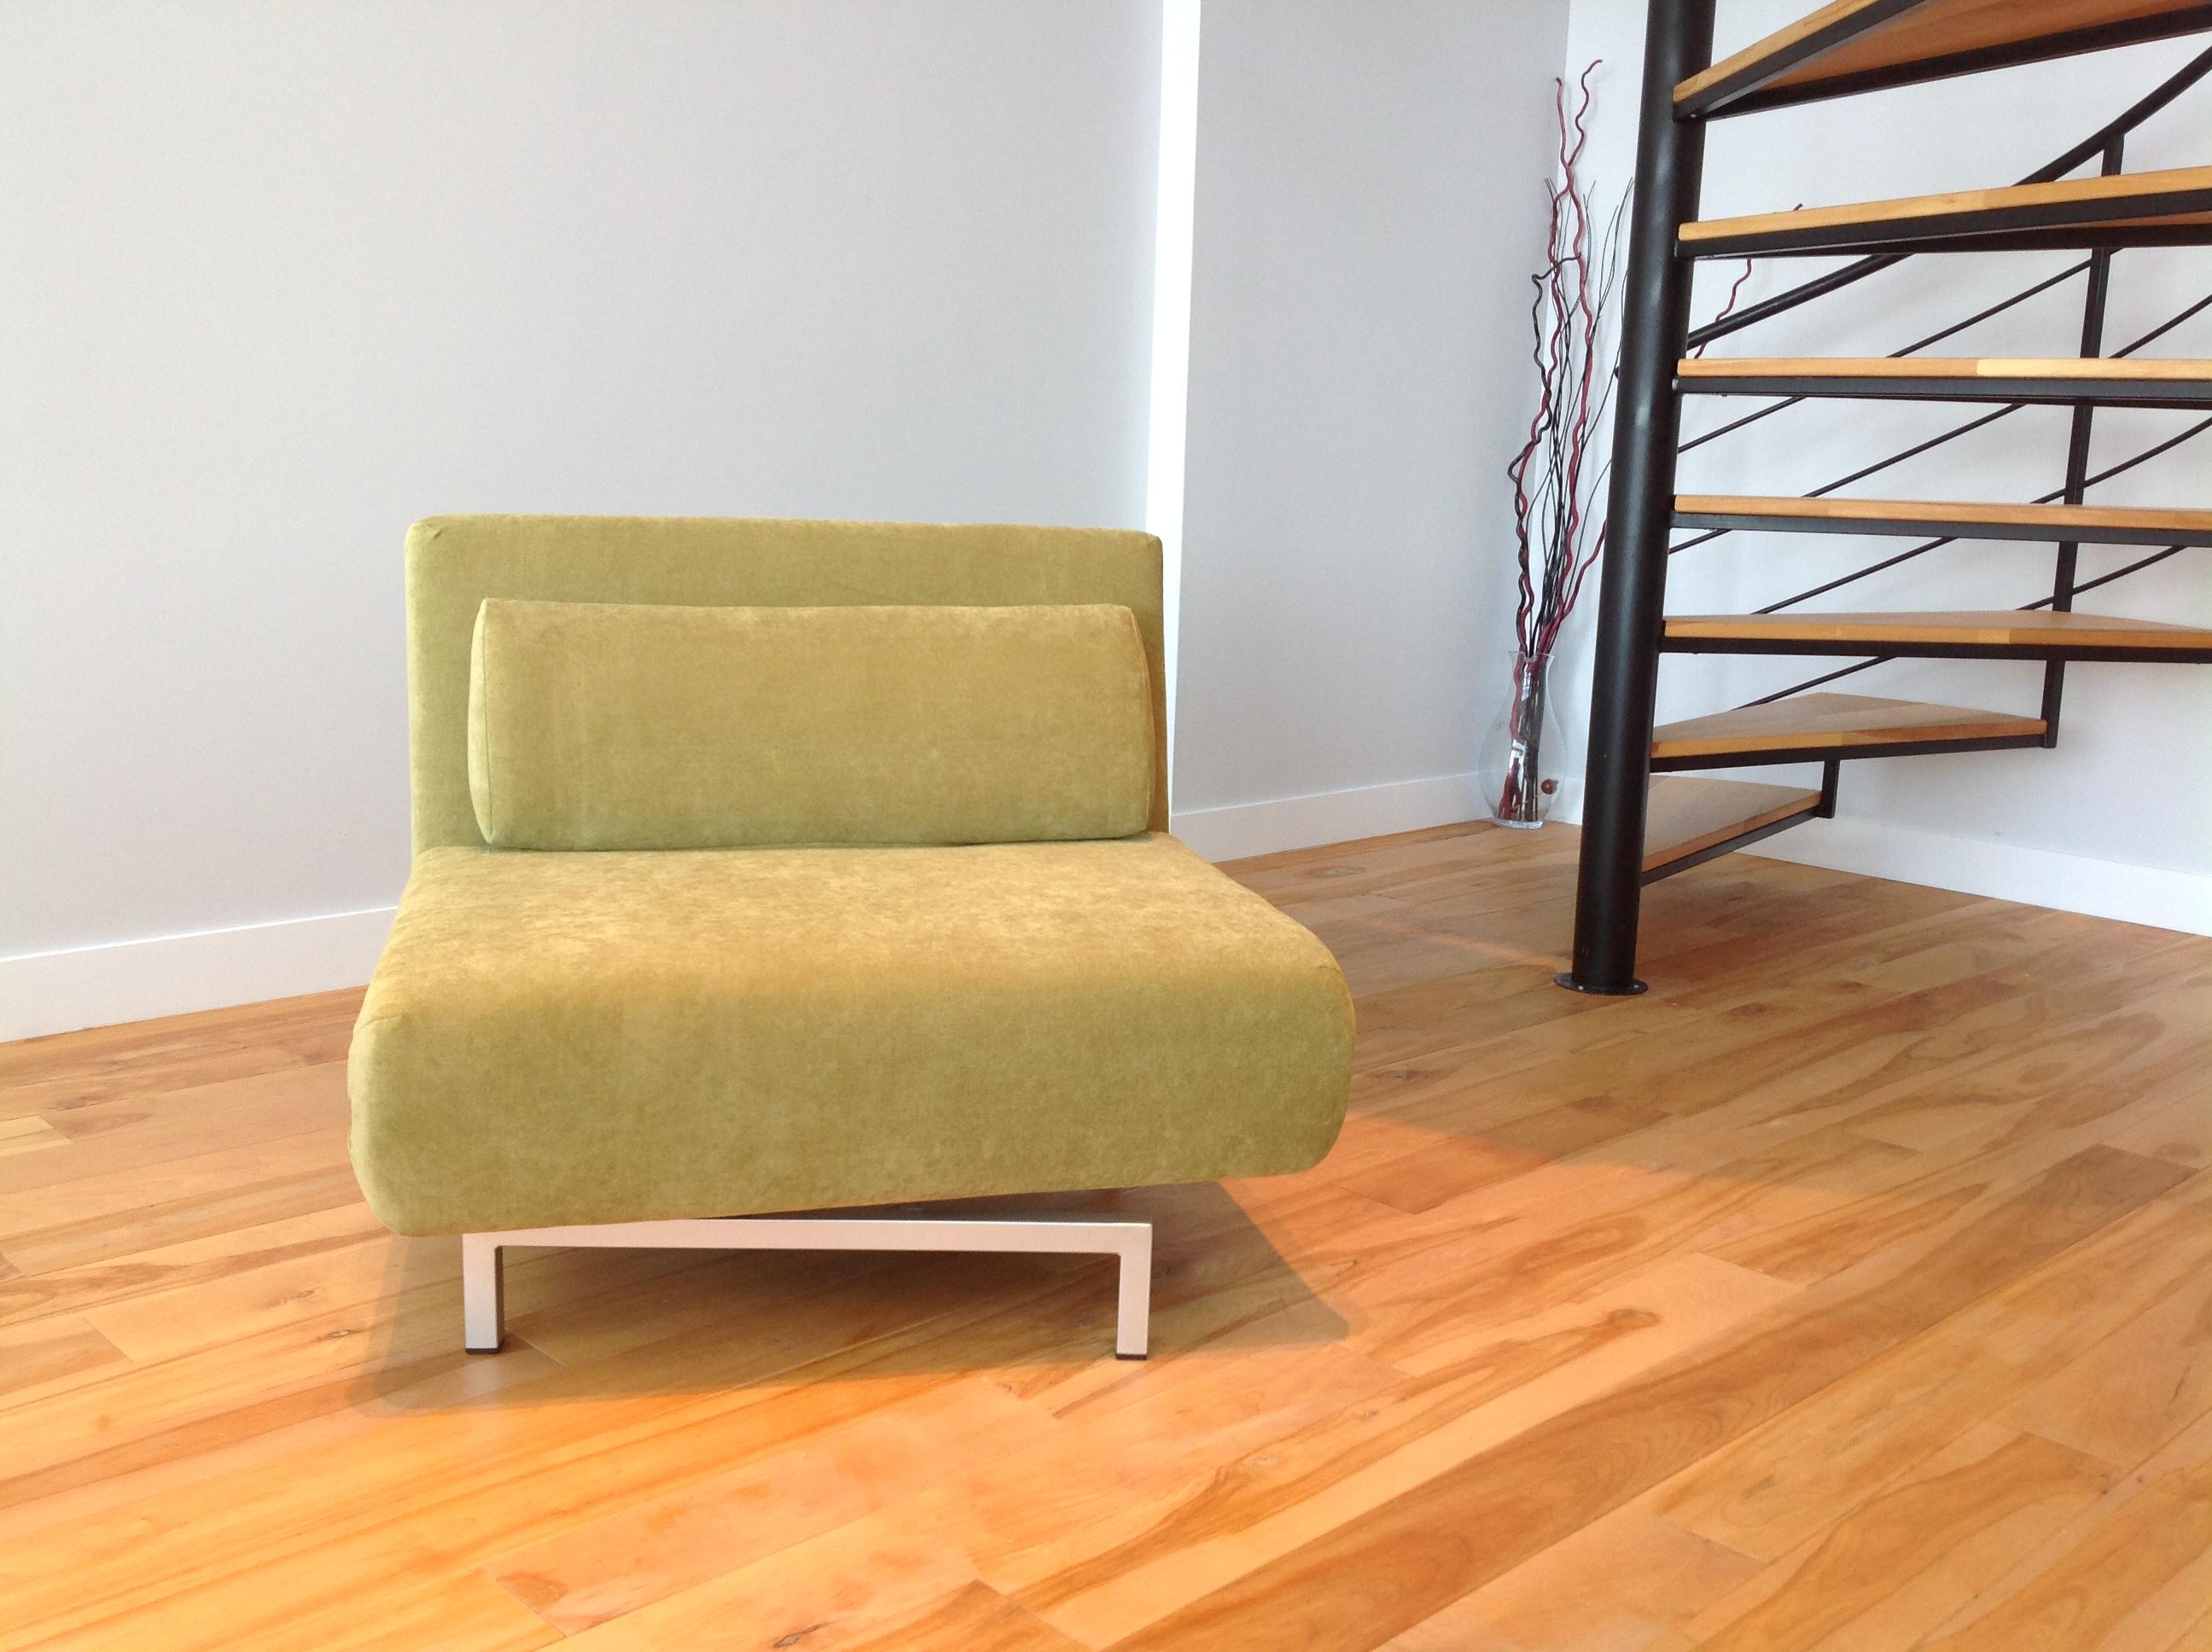 iso futon chez soi. Black Bedroom Furniture Sets. Home Design Ideas